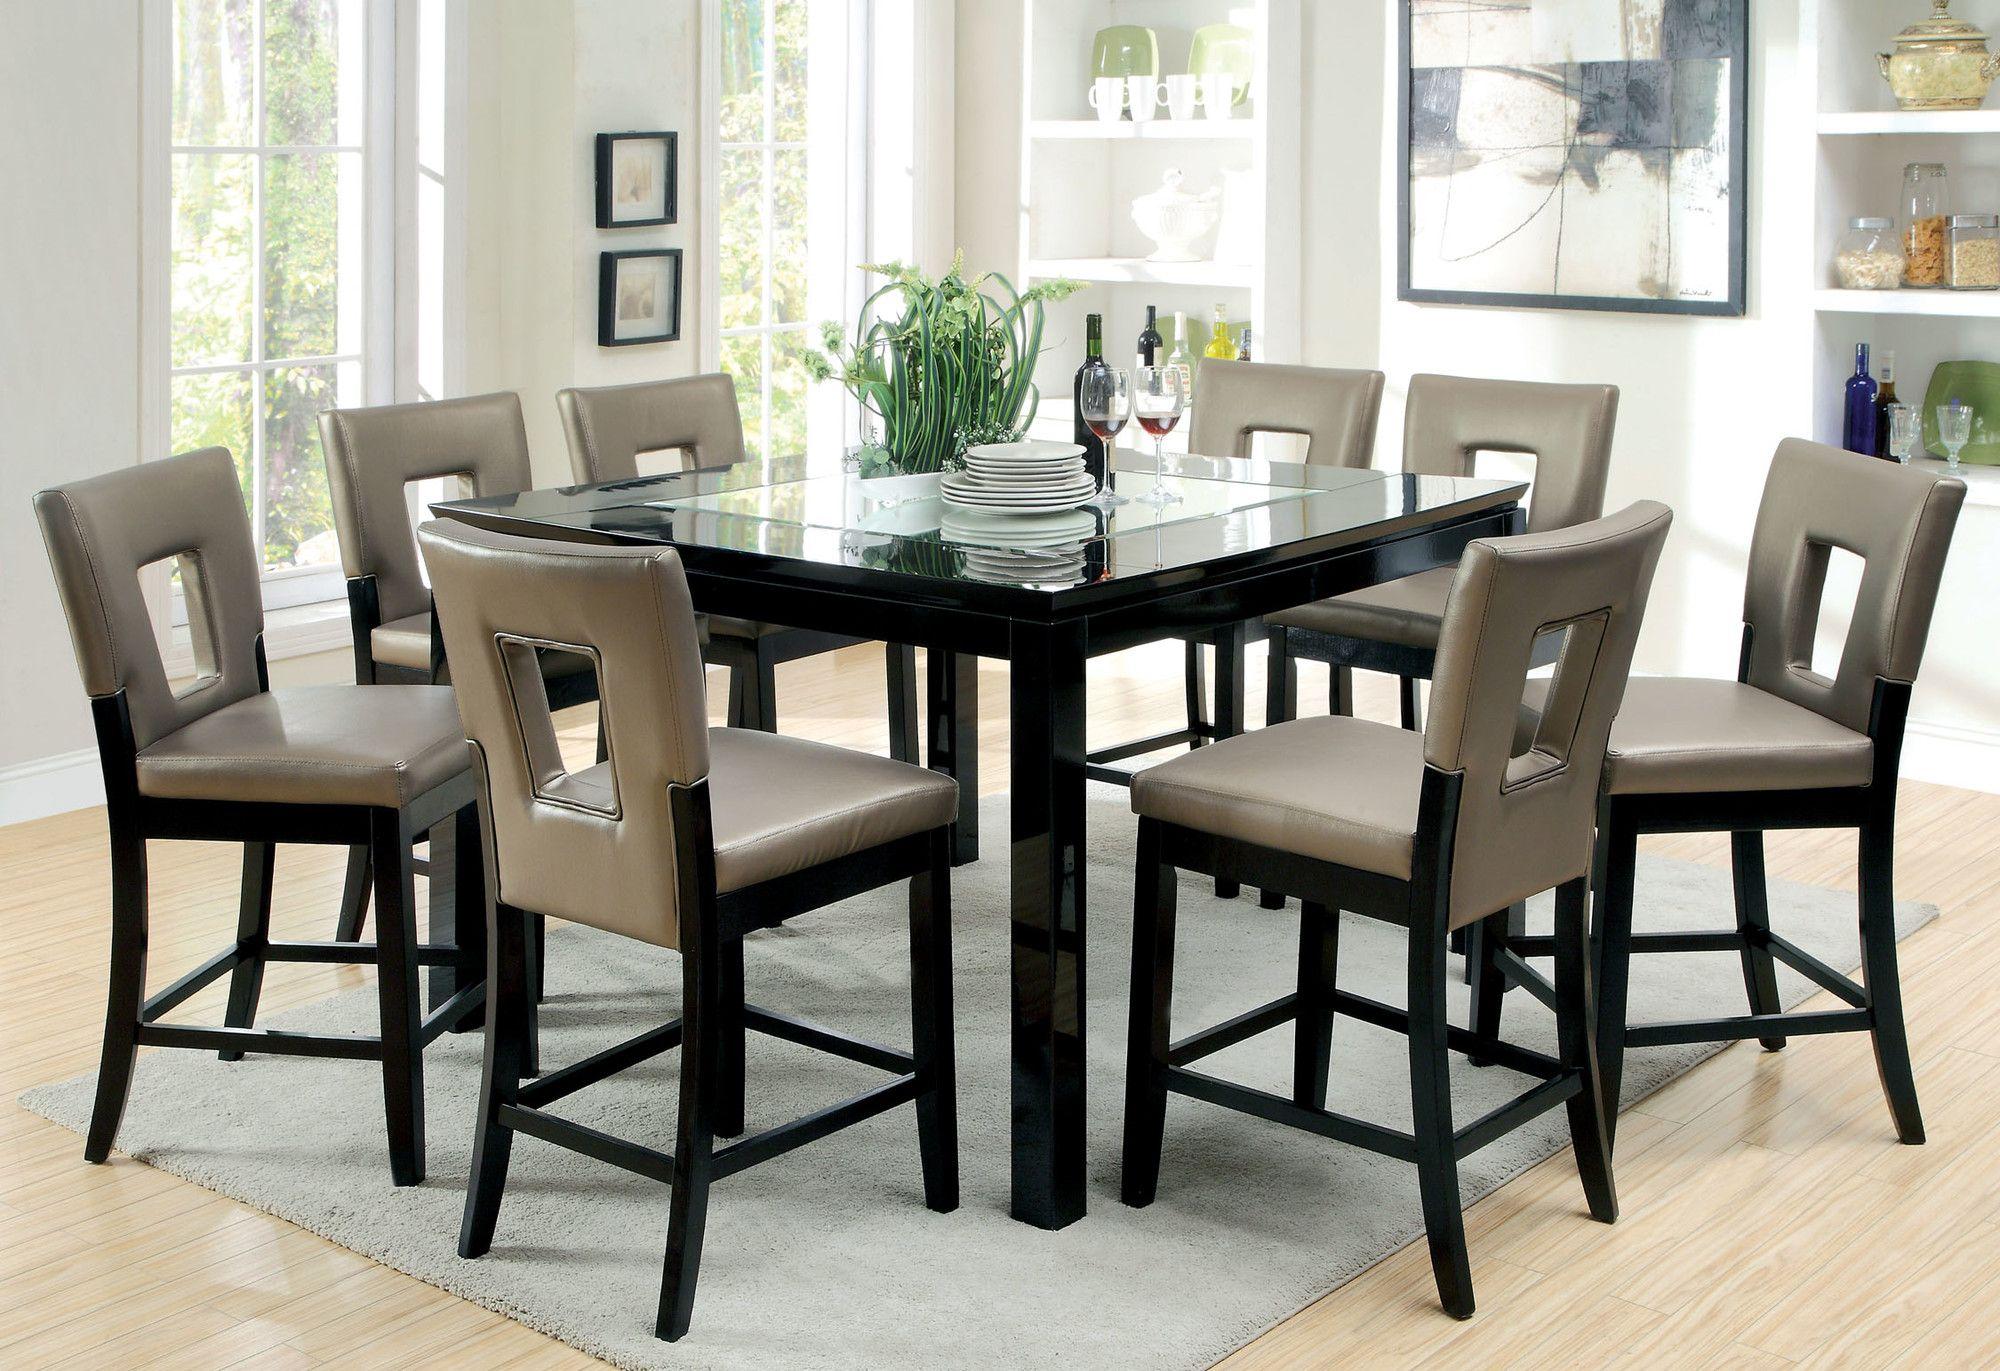 Hokku Designs Vanderbilte 9 Piece Counter Height Dining Set Dining Table Counter Height Dining Sets Counter Height Table Sets